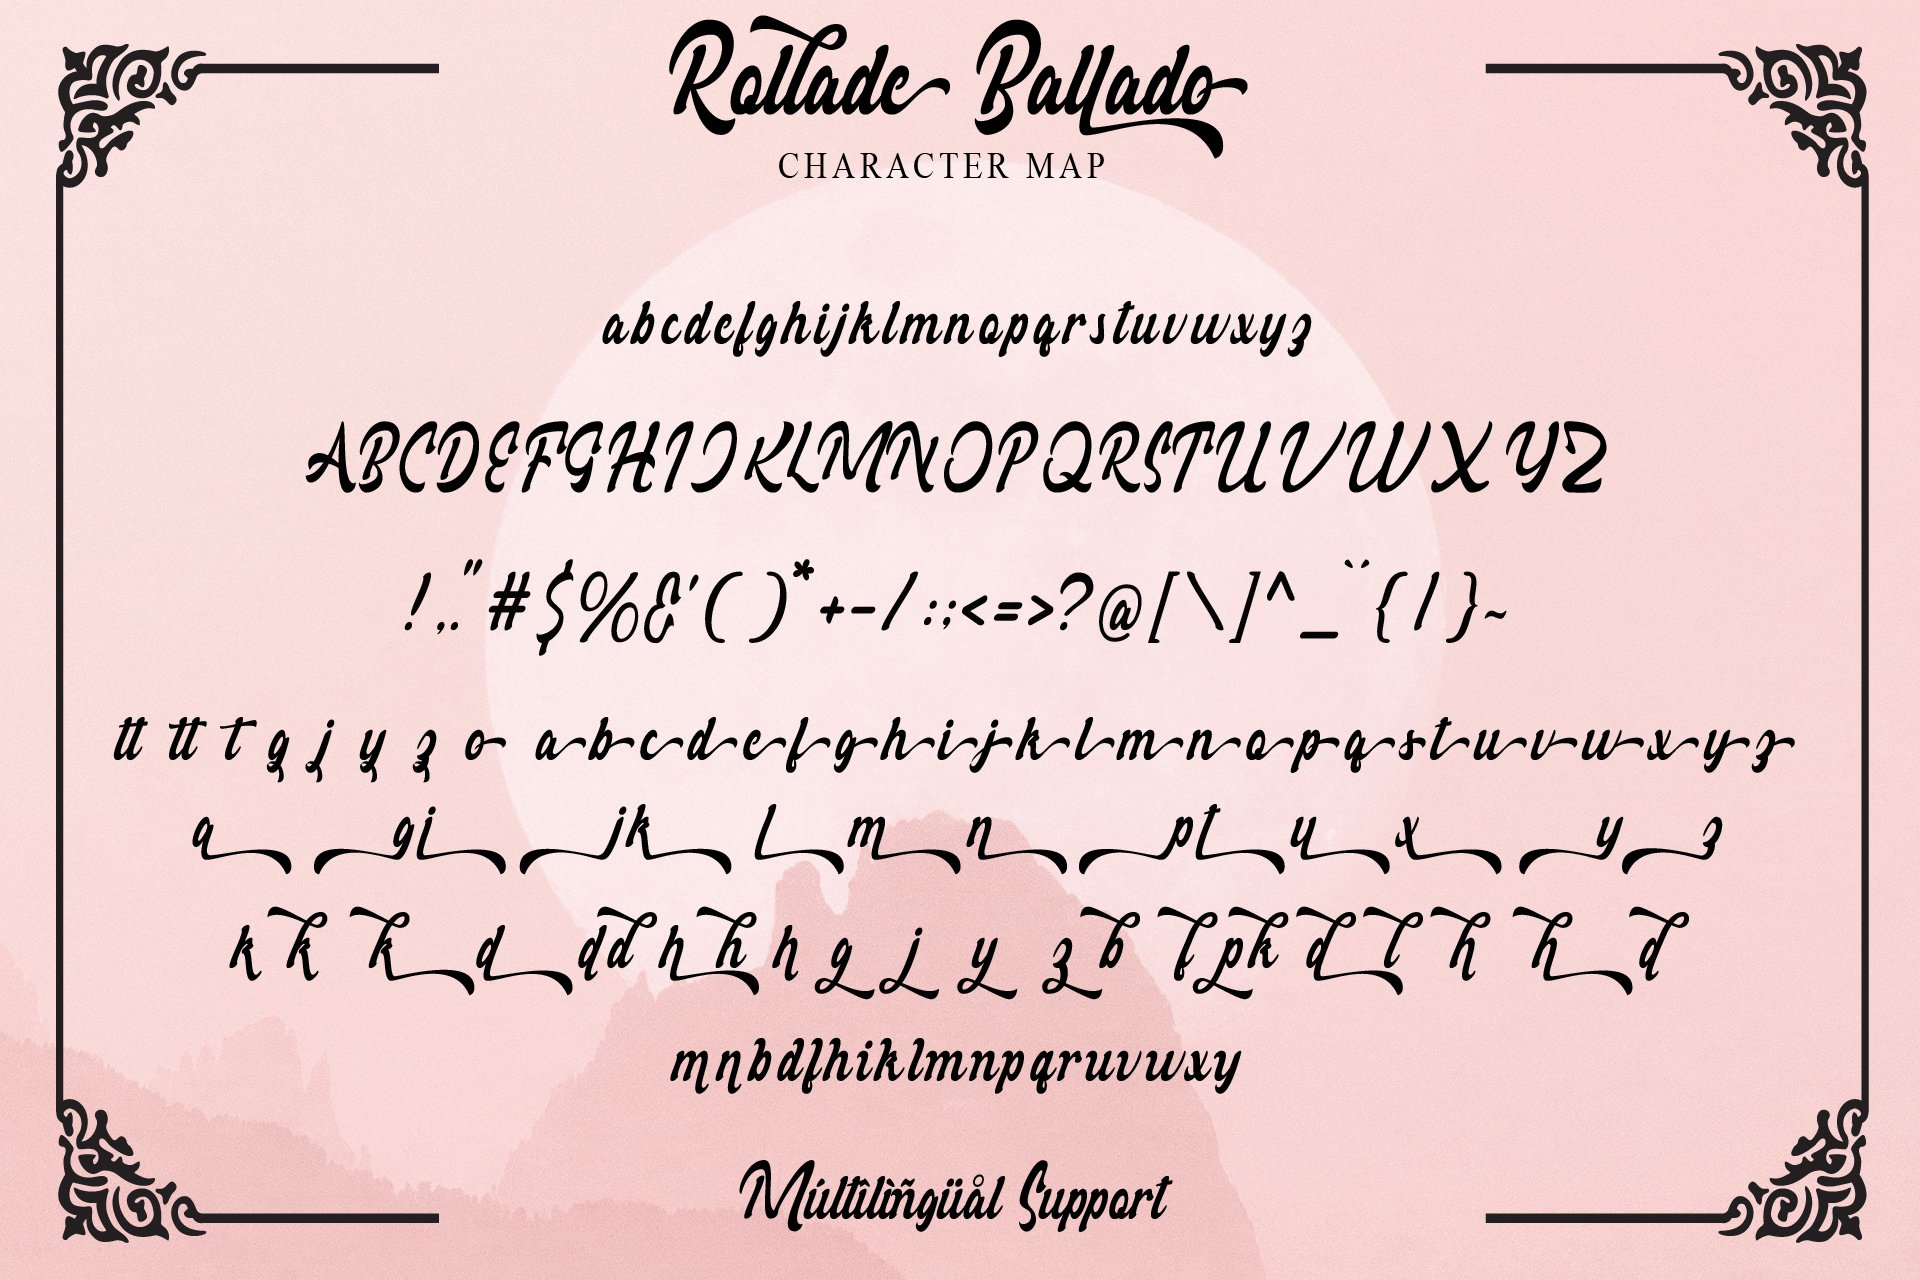 Rollade Ballado Bold Script Font -3